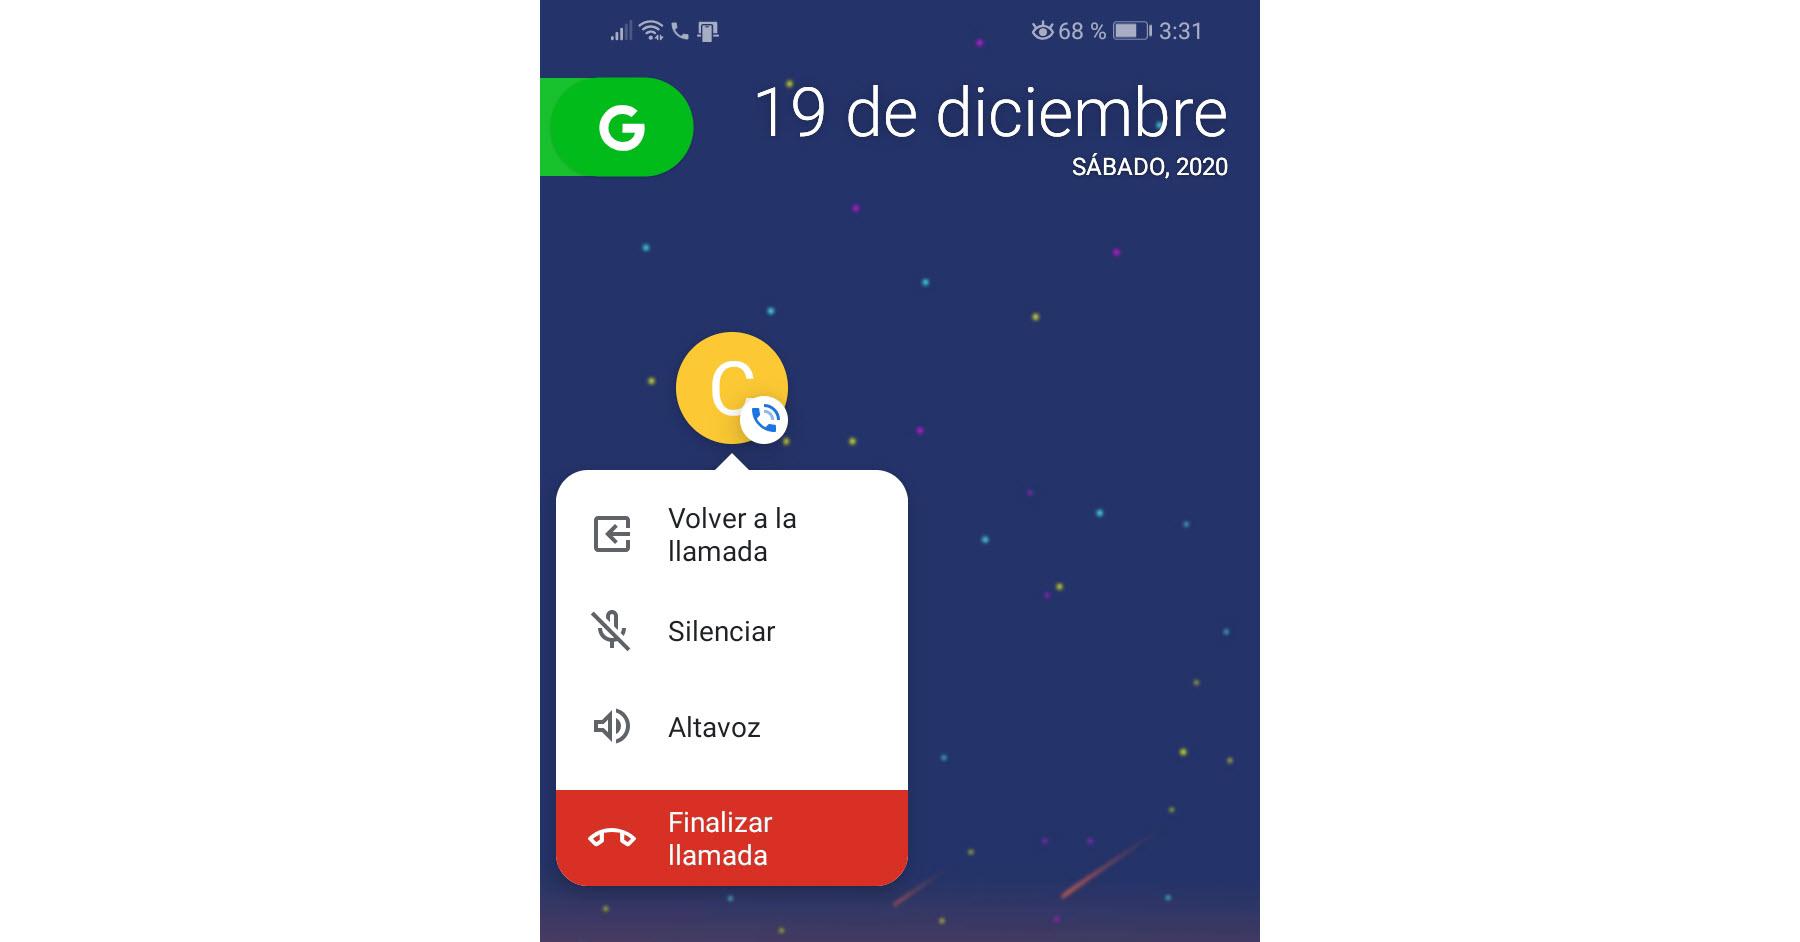 Cómo minimizar llamadas a una «burbuja de chat» estilo Messenger